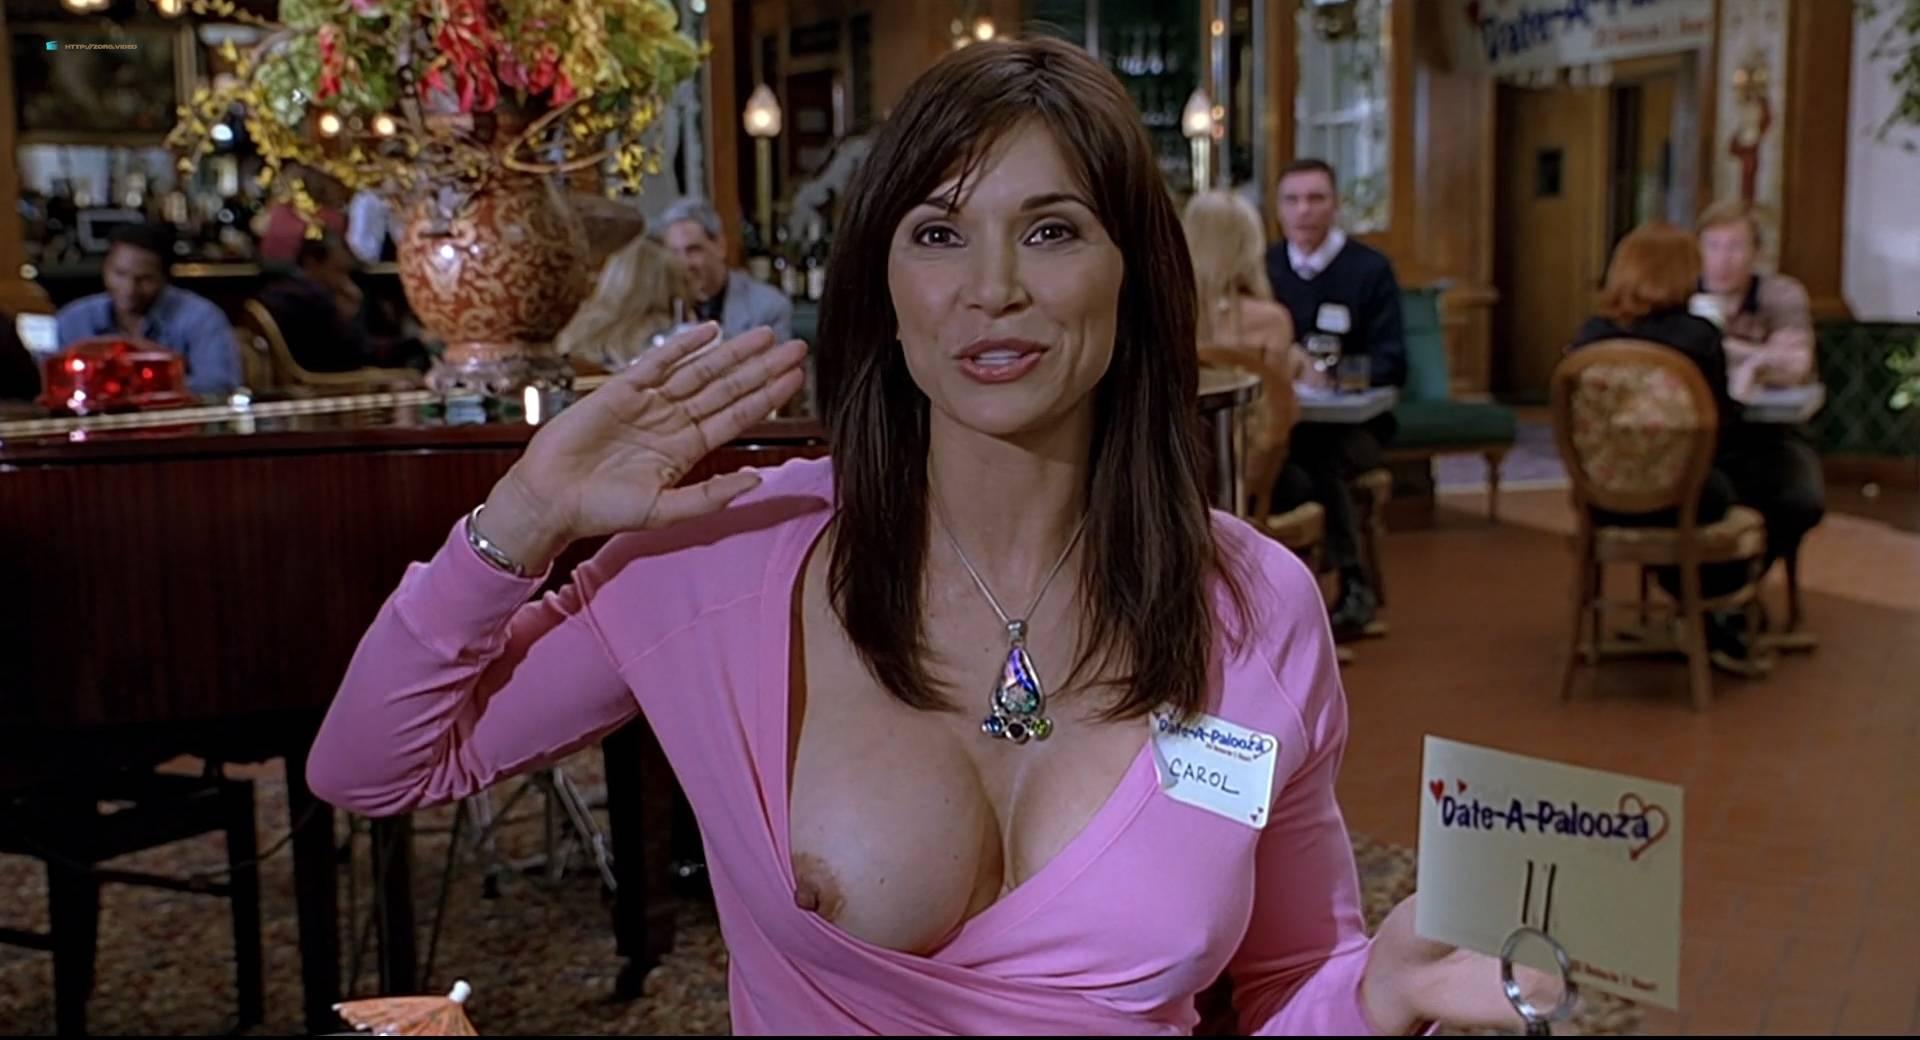 40 year old virgin speed dating girl nipple